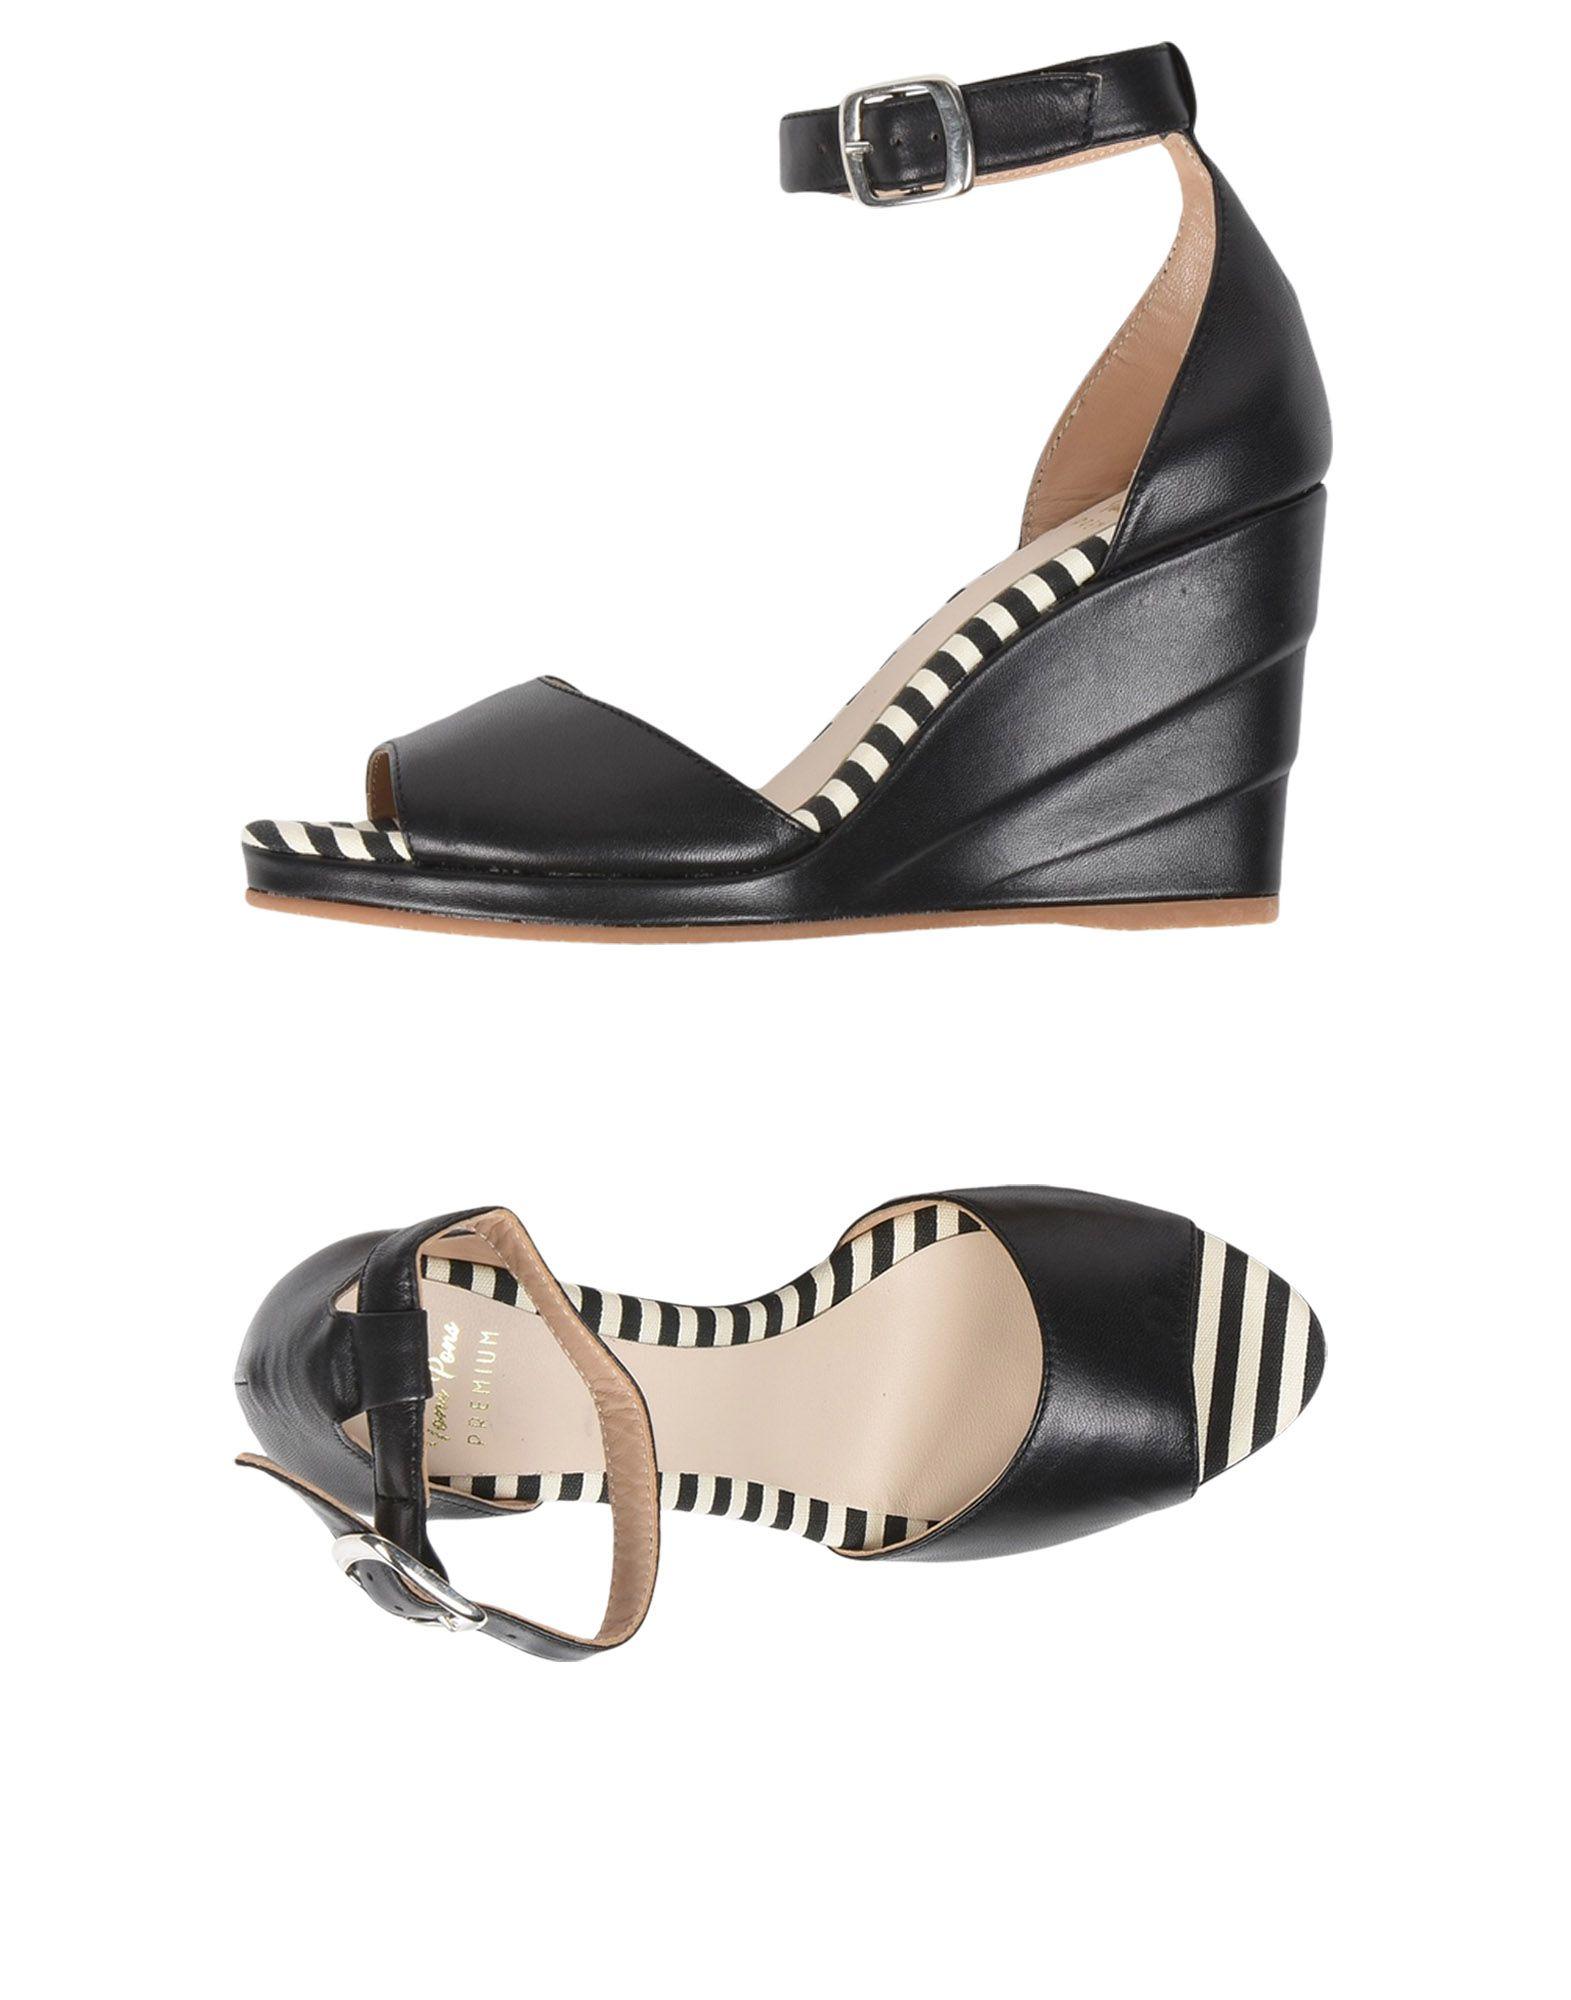 Toni Pons Sandalen Damen  11388394VC Gute Qualität beliebte Schuhe